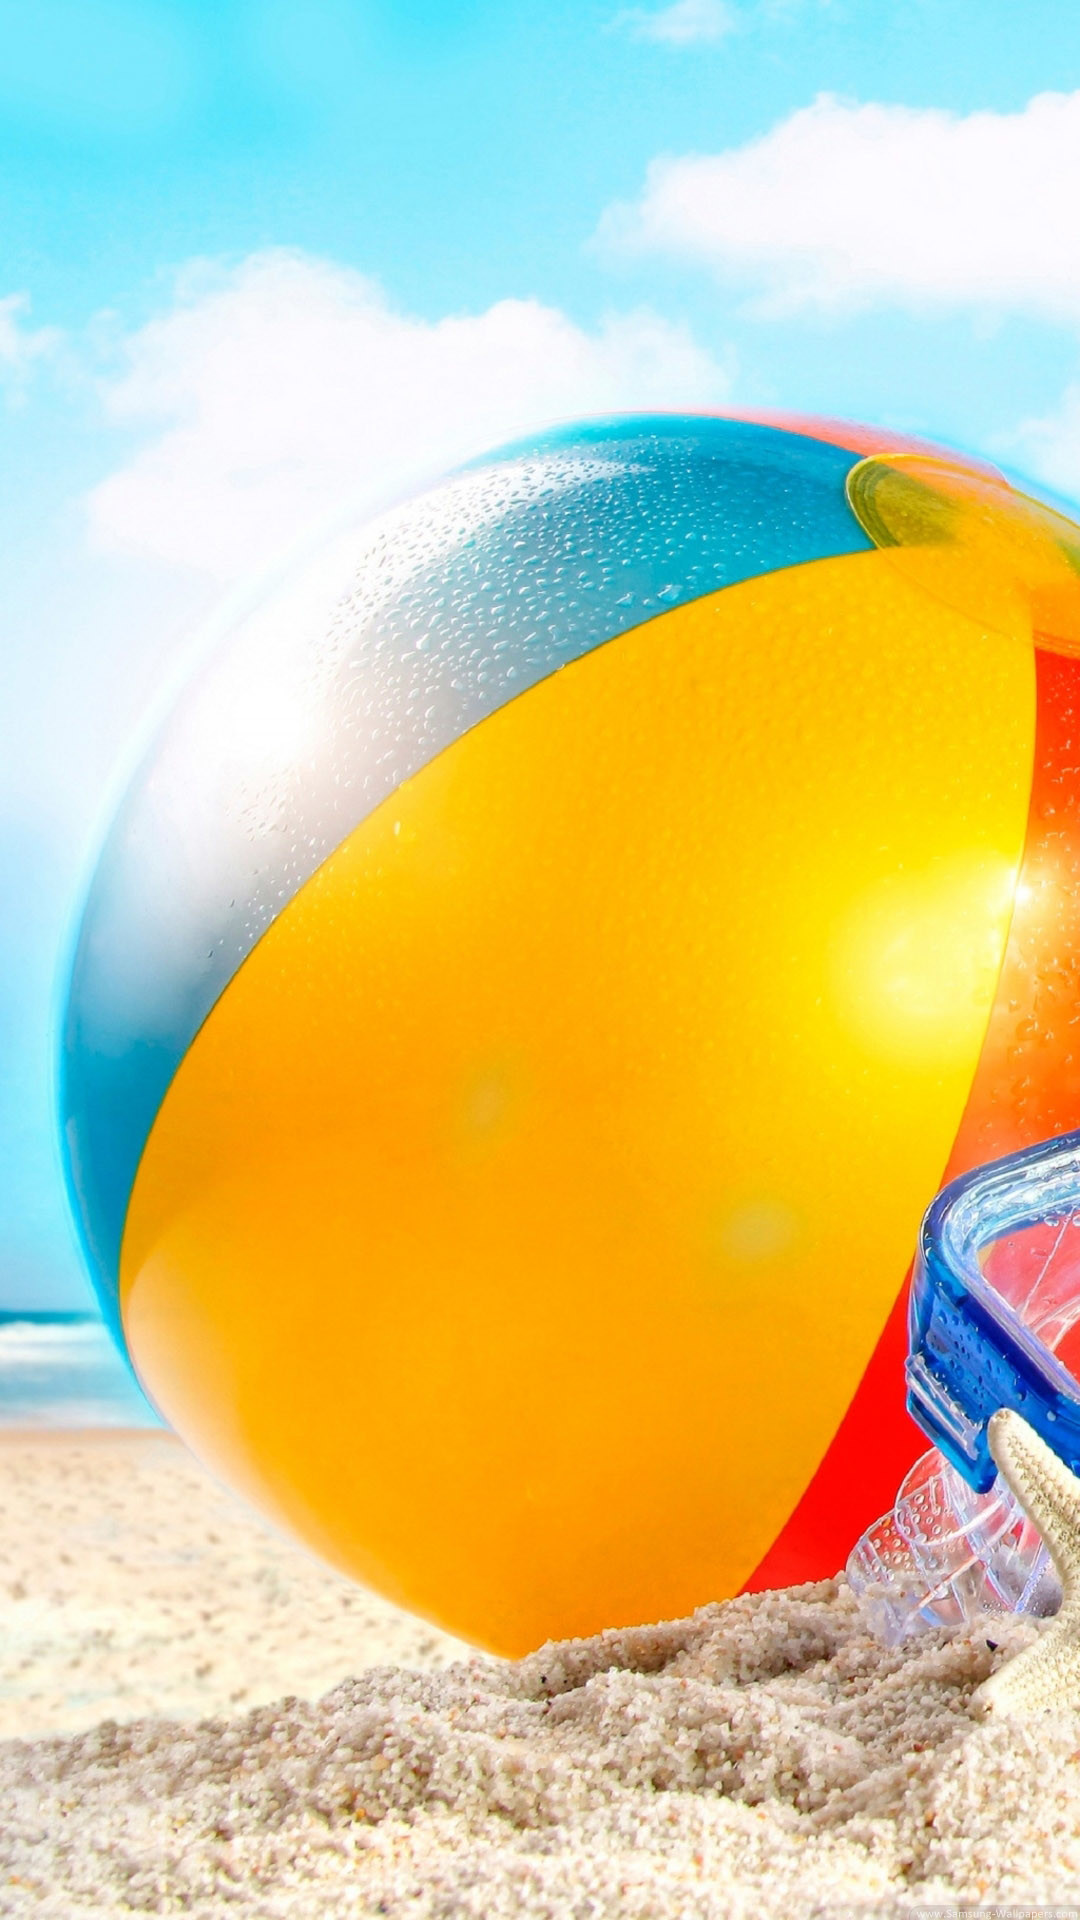 Beachball In Sand Summer iPhone 6 Plus HD Wallpaper …